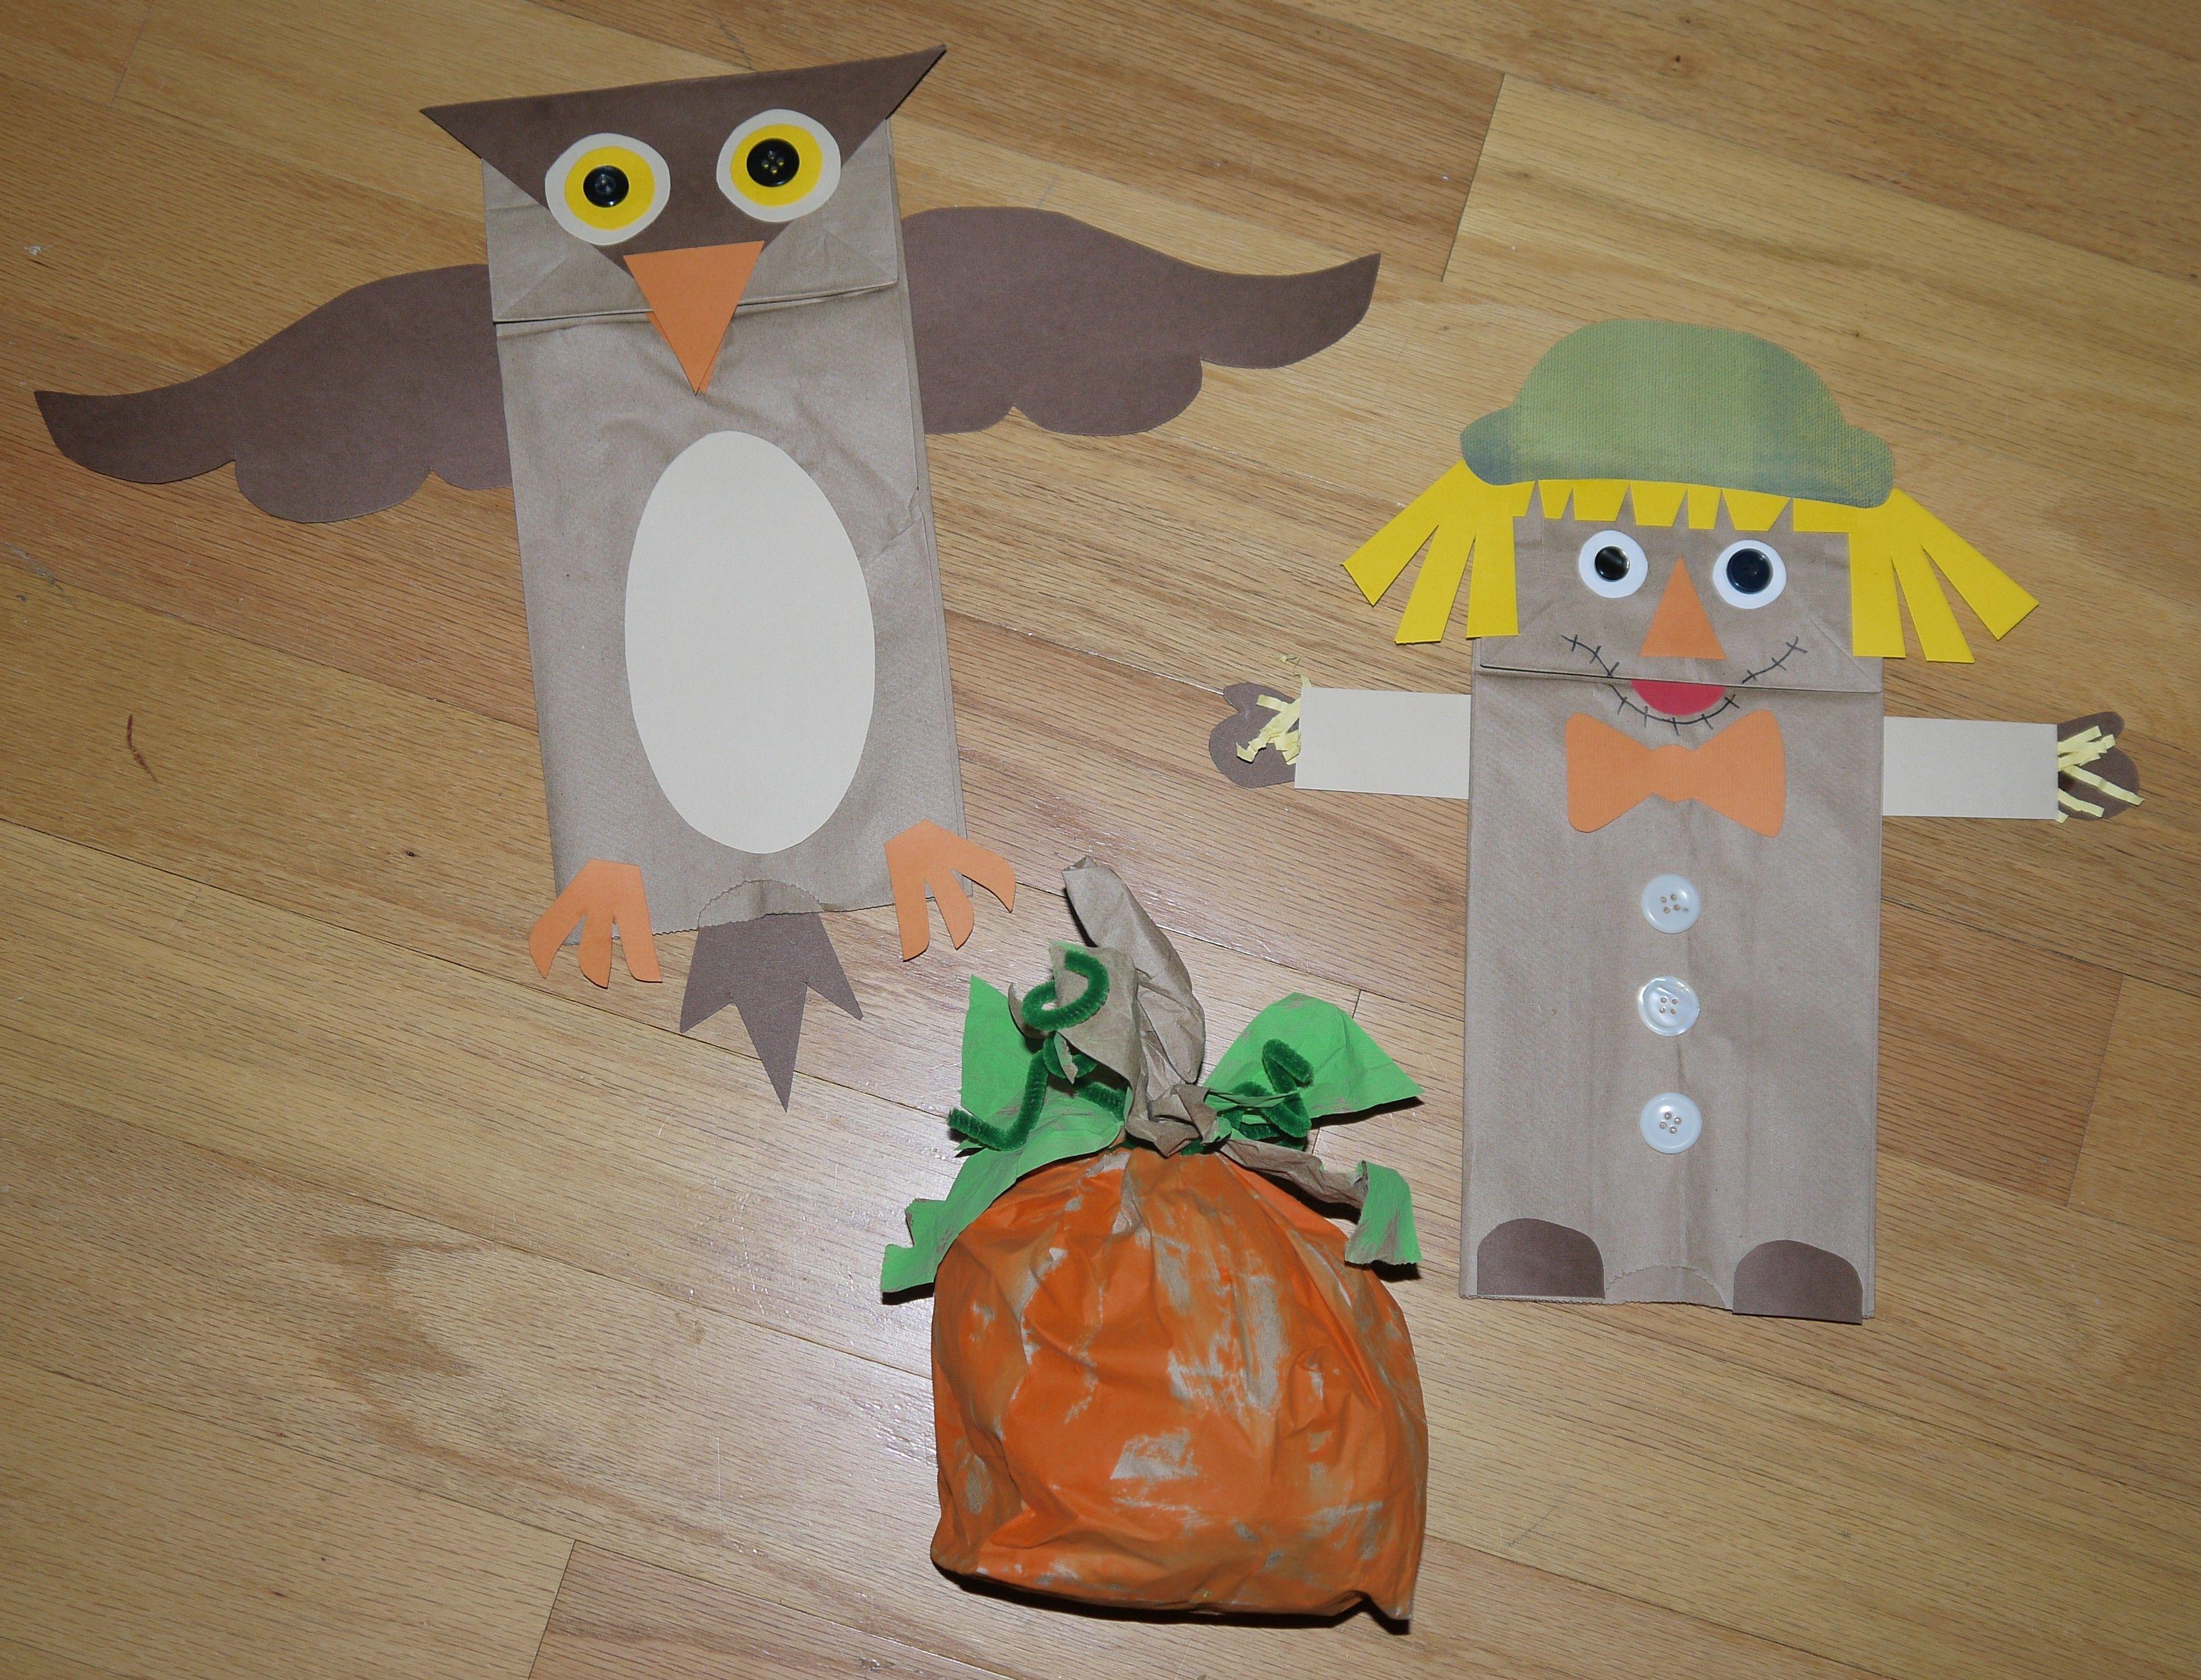 Autumn paper bag crafts from cheap crafty mama kid blogger autumn paper bag crafts from cheap crafty mama jeuxipadfo Gallery